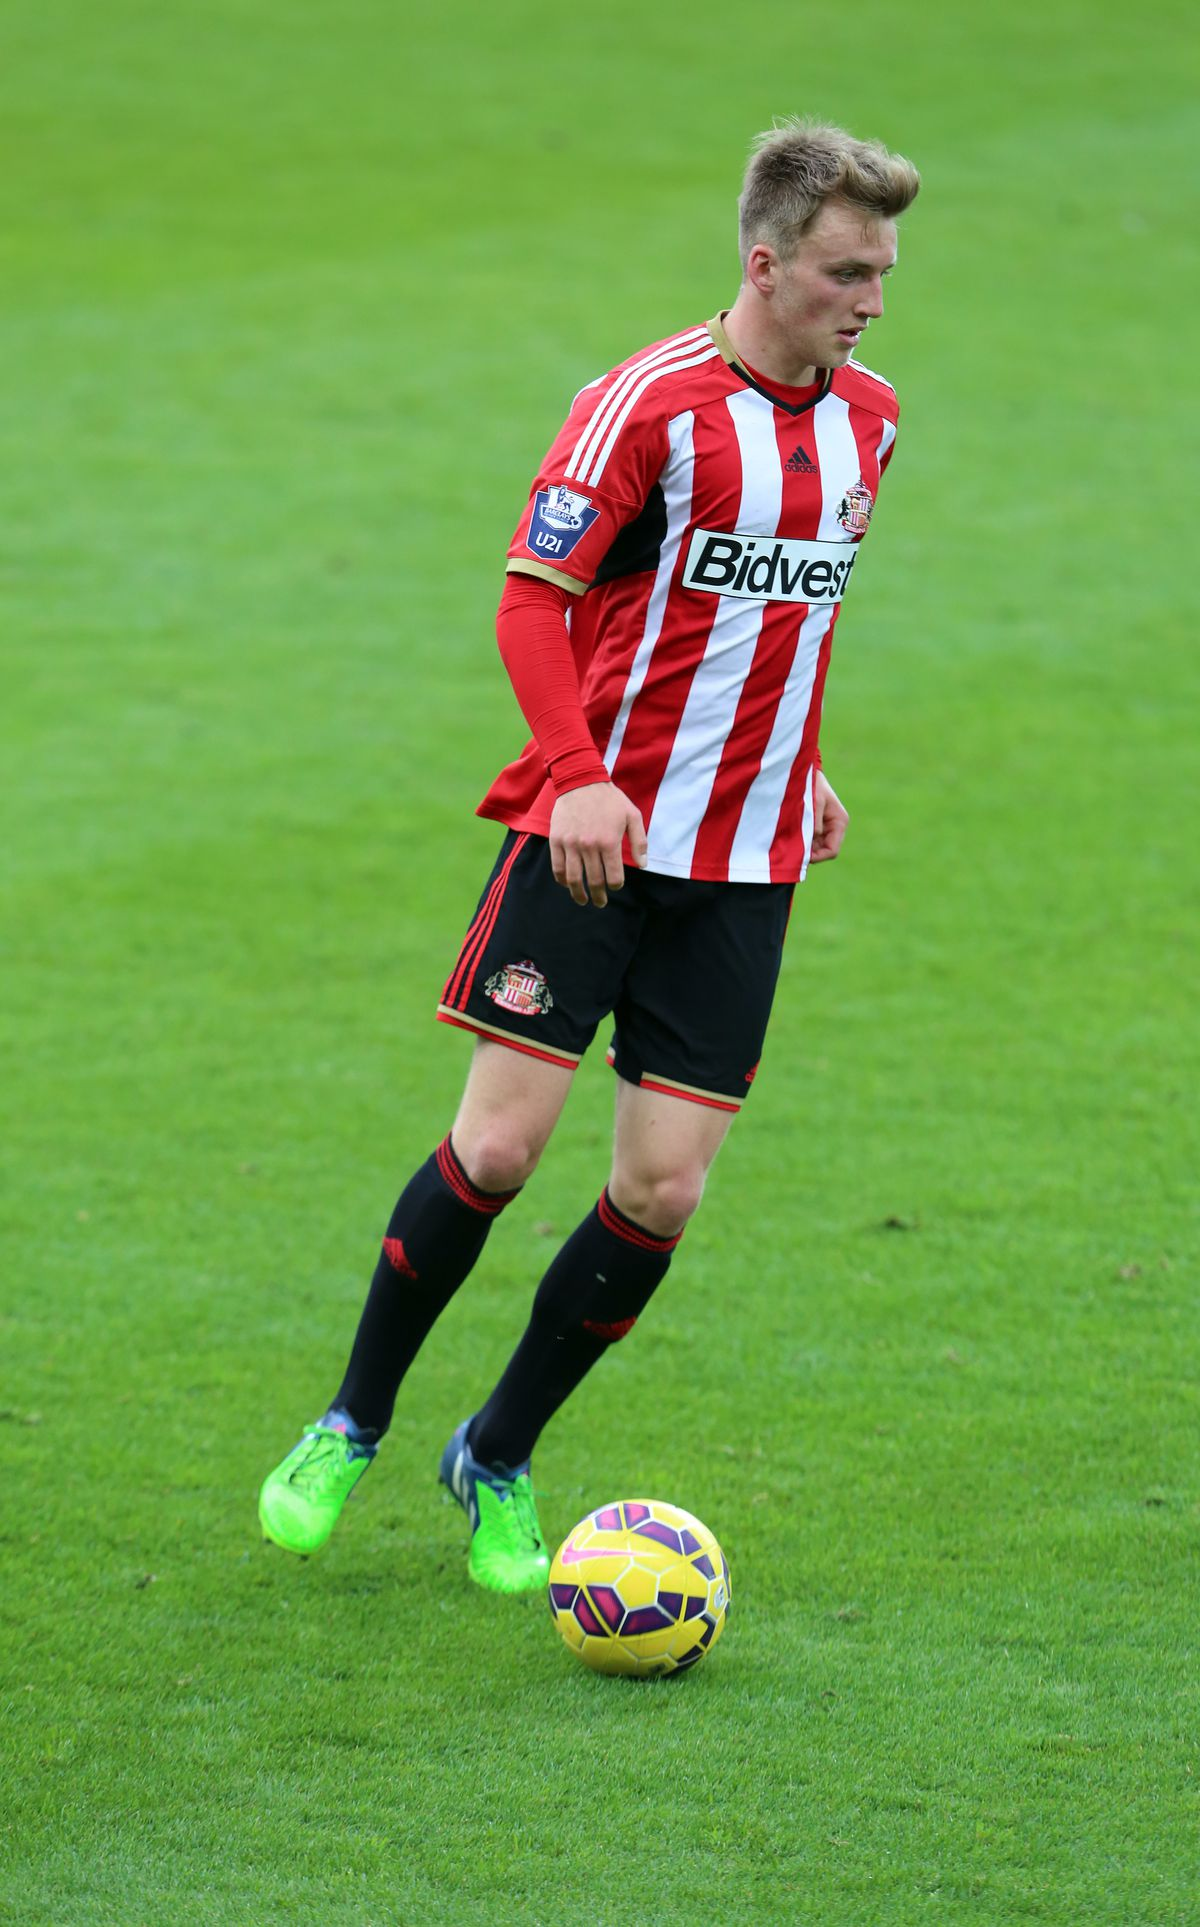 Sunderland v Chelsea - U21 Premier League